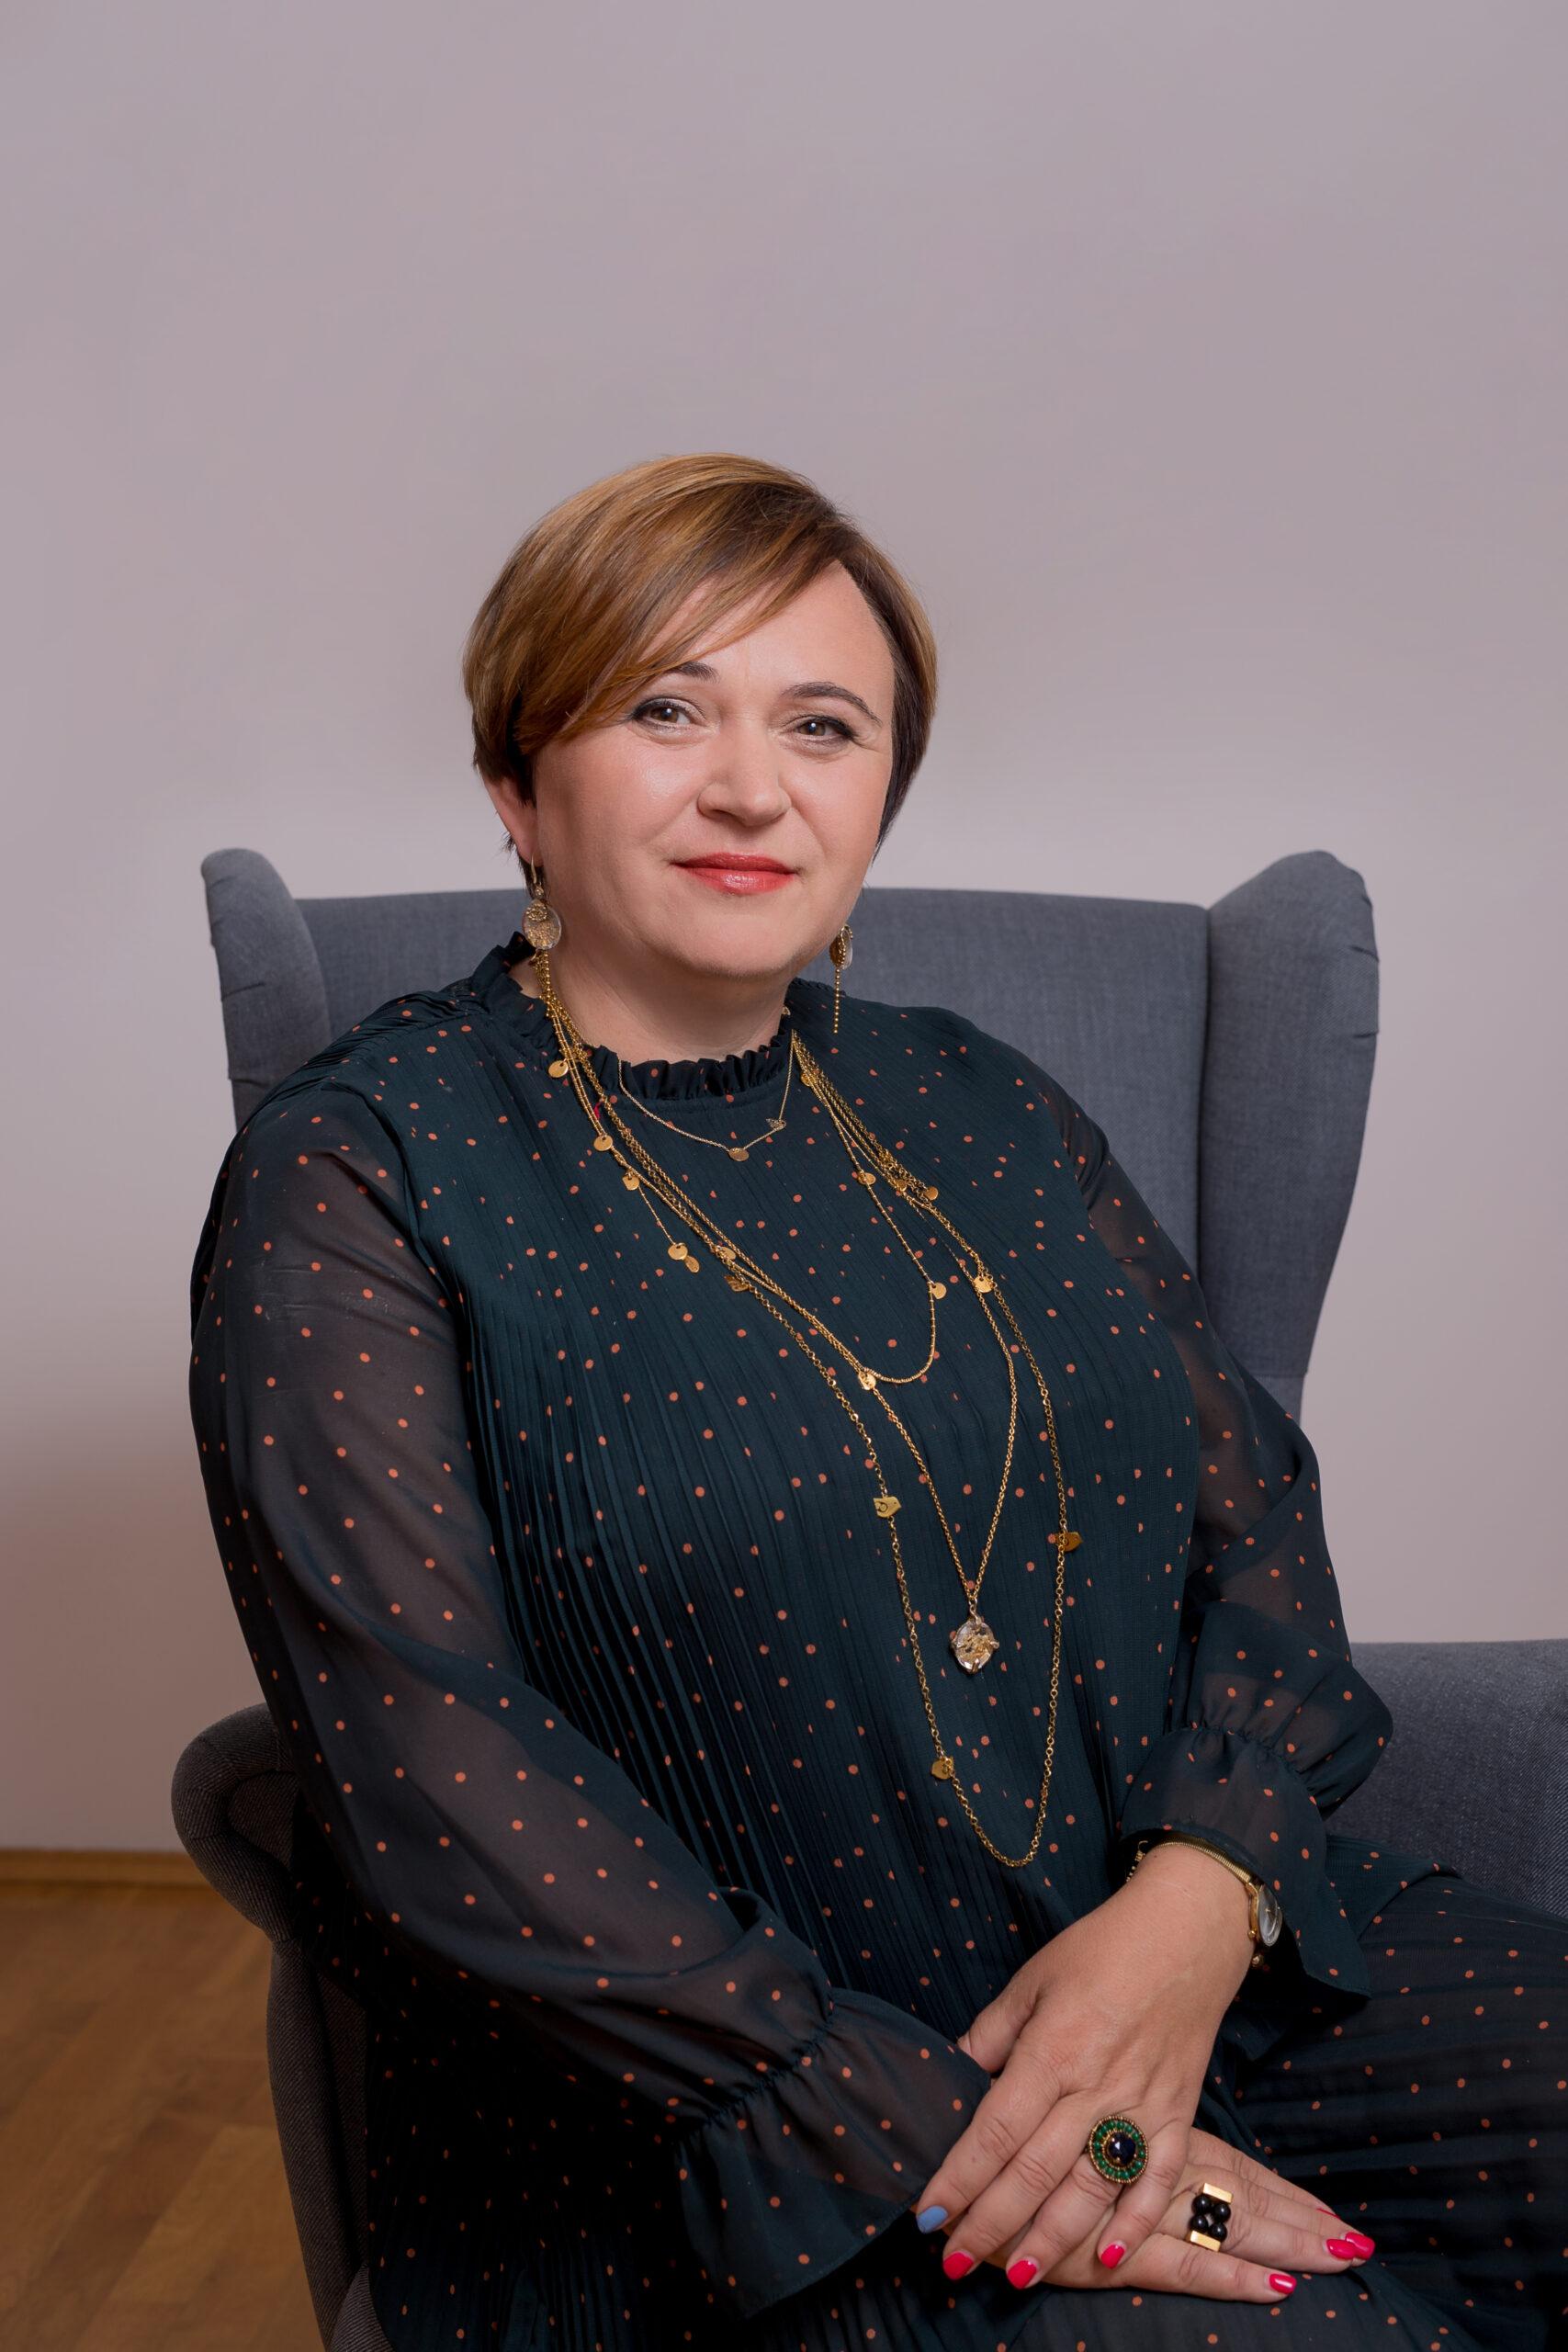 dorota-kowalska-klamer-psychoterapeutka